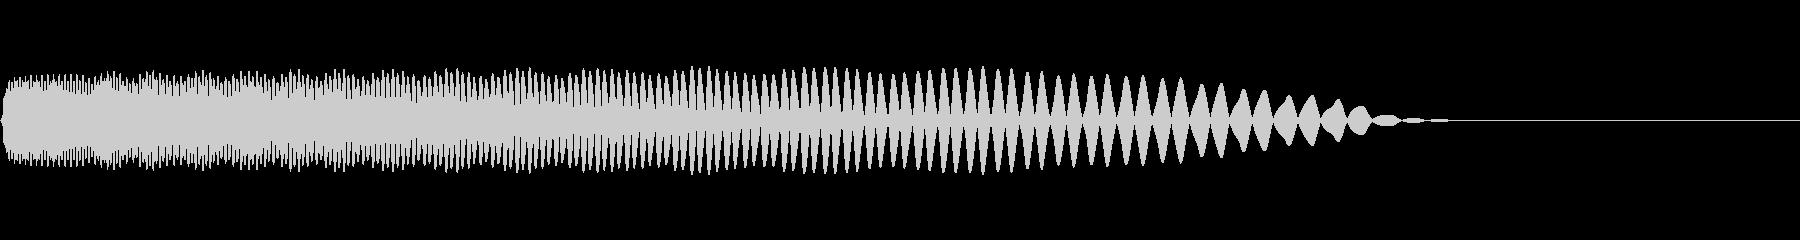 【SE 効果音】SF的な音12の未再生の波形